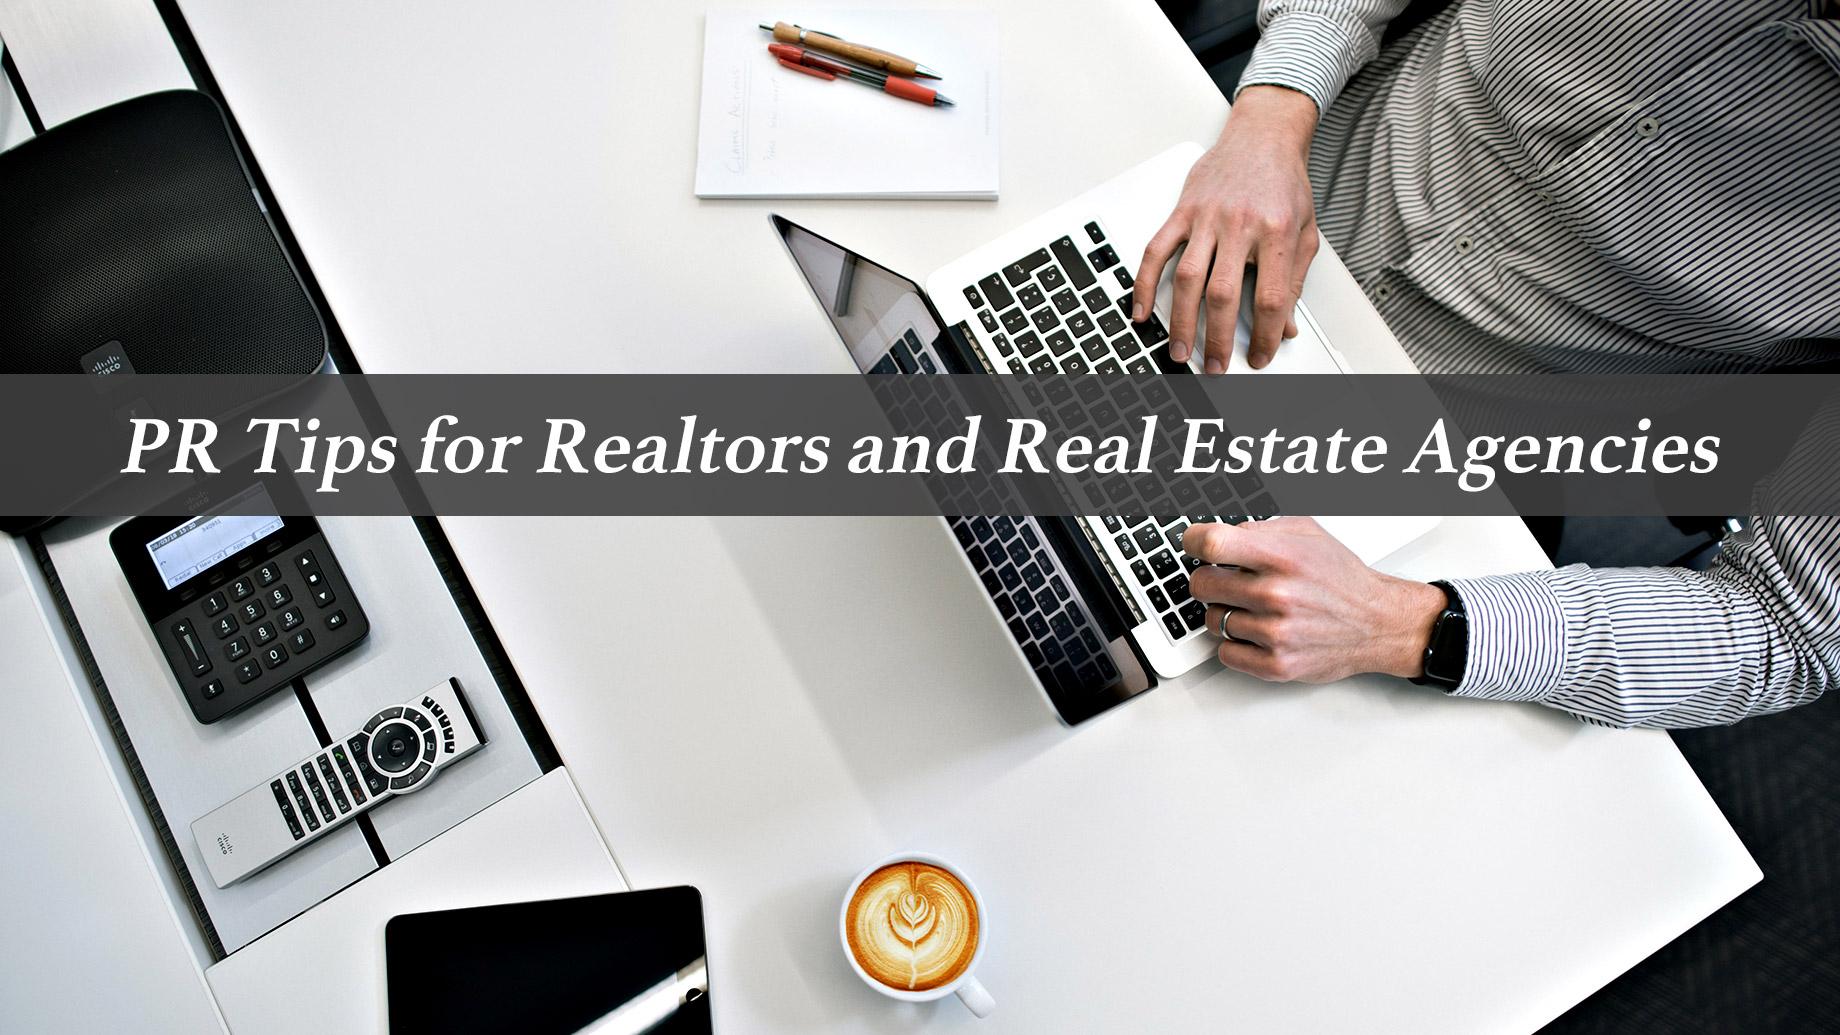 PR Tips for Realtors and Real Estate Agencies